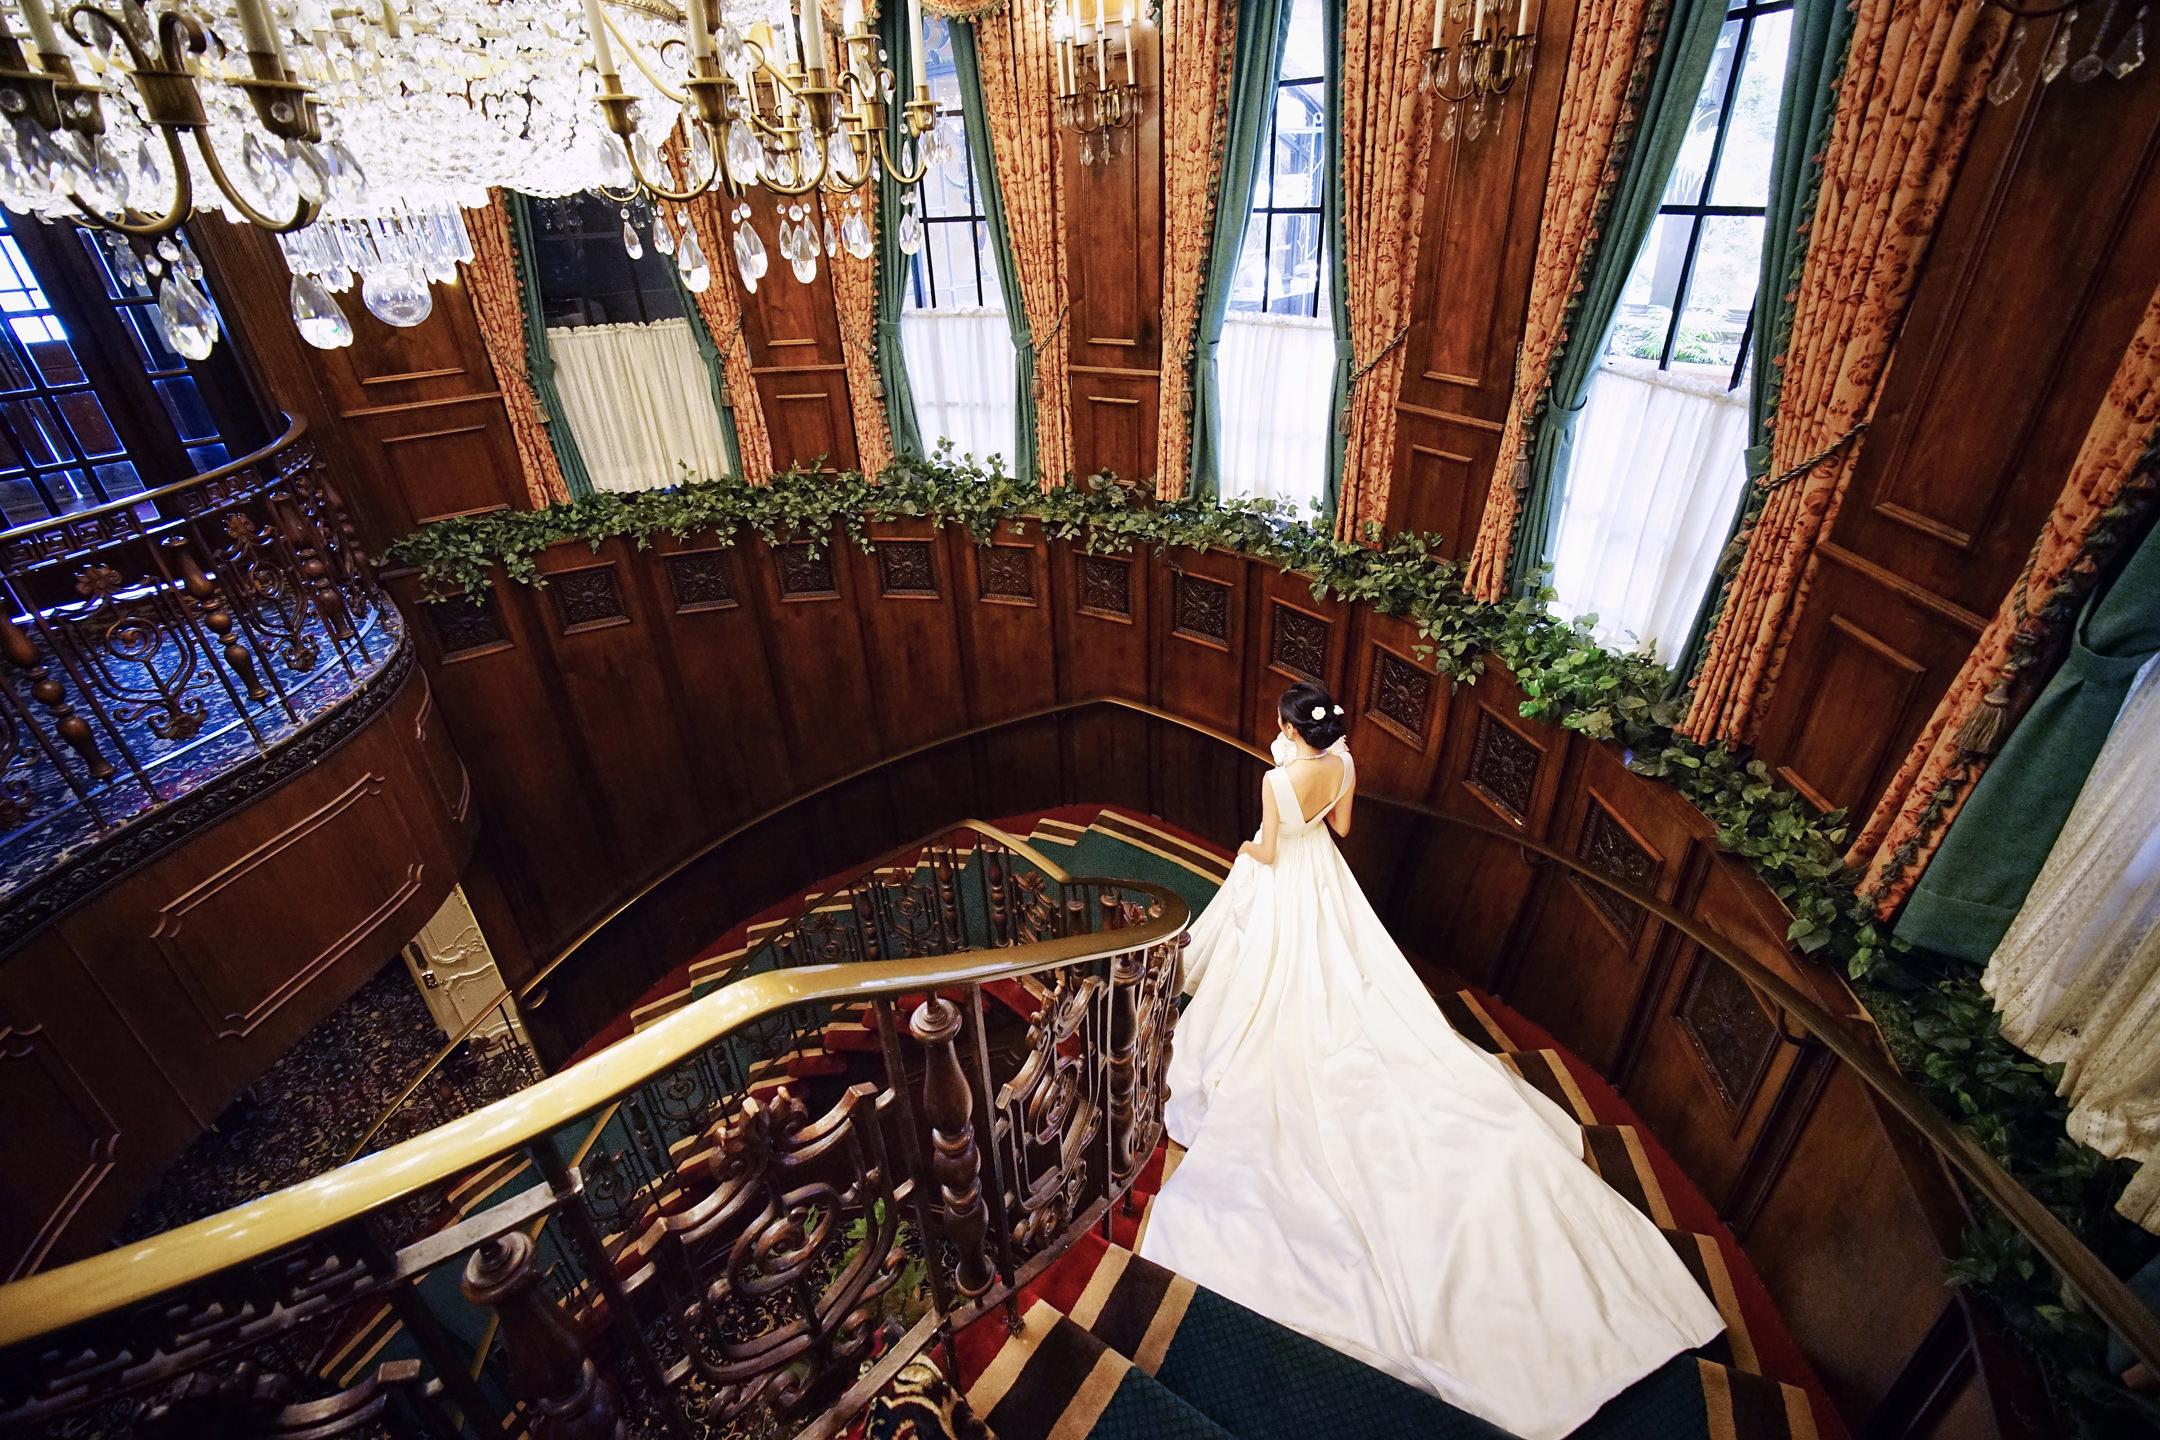 the_Manor-New_Jersey_NJ_Wedding003_Wedding001_Chris_Hui_Photoraphy.JPG